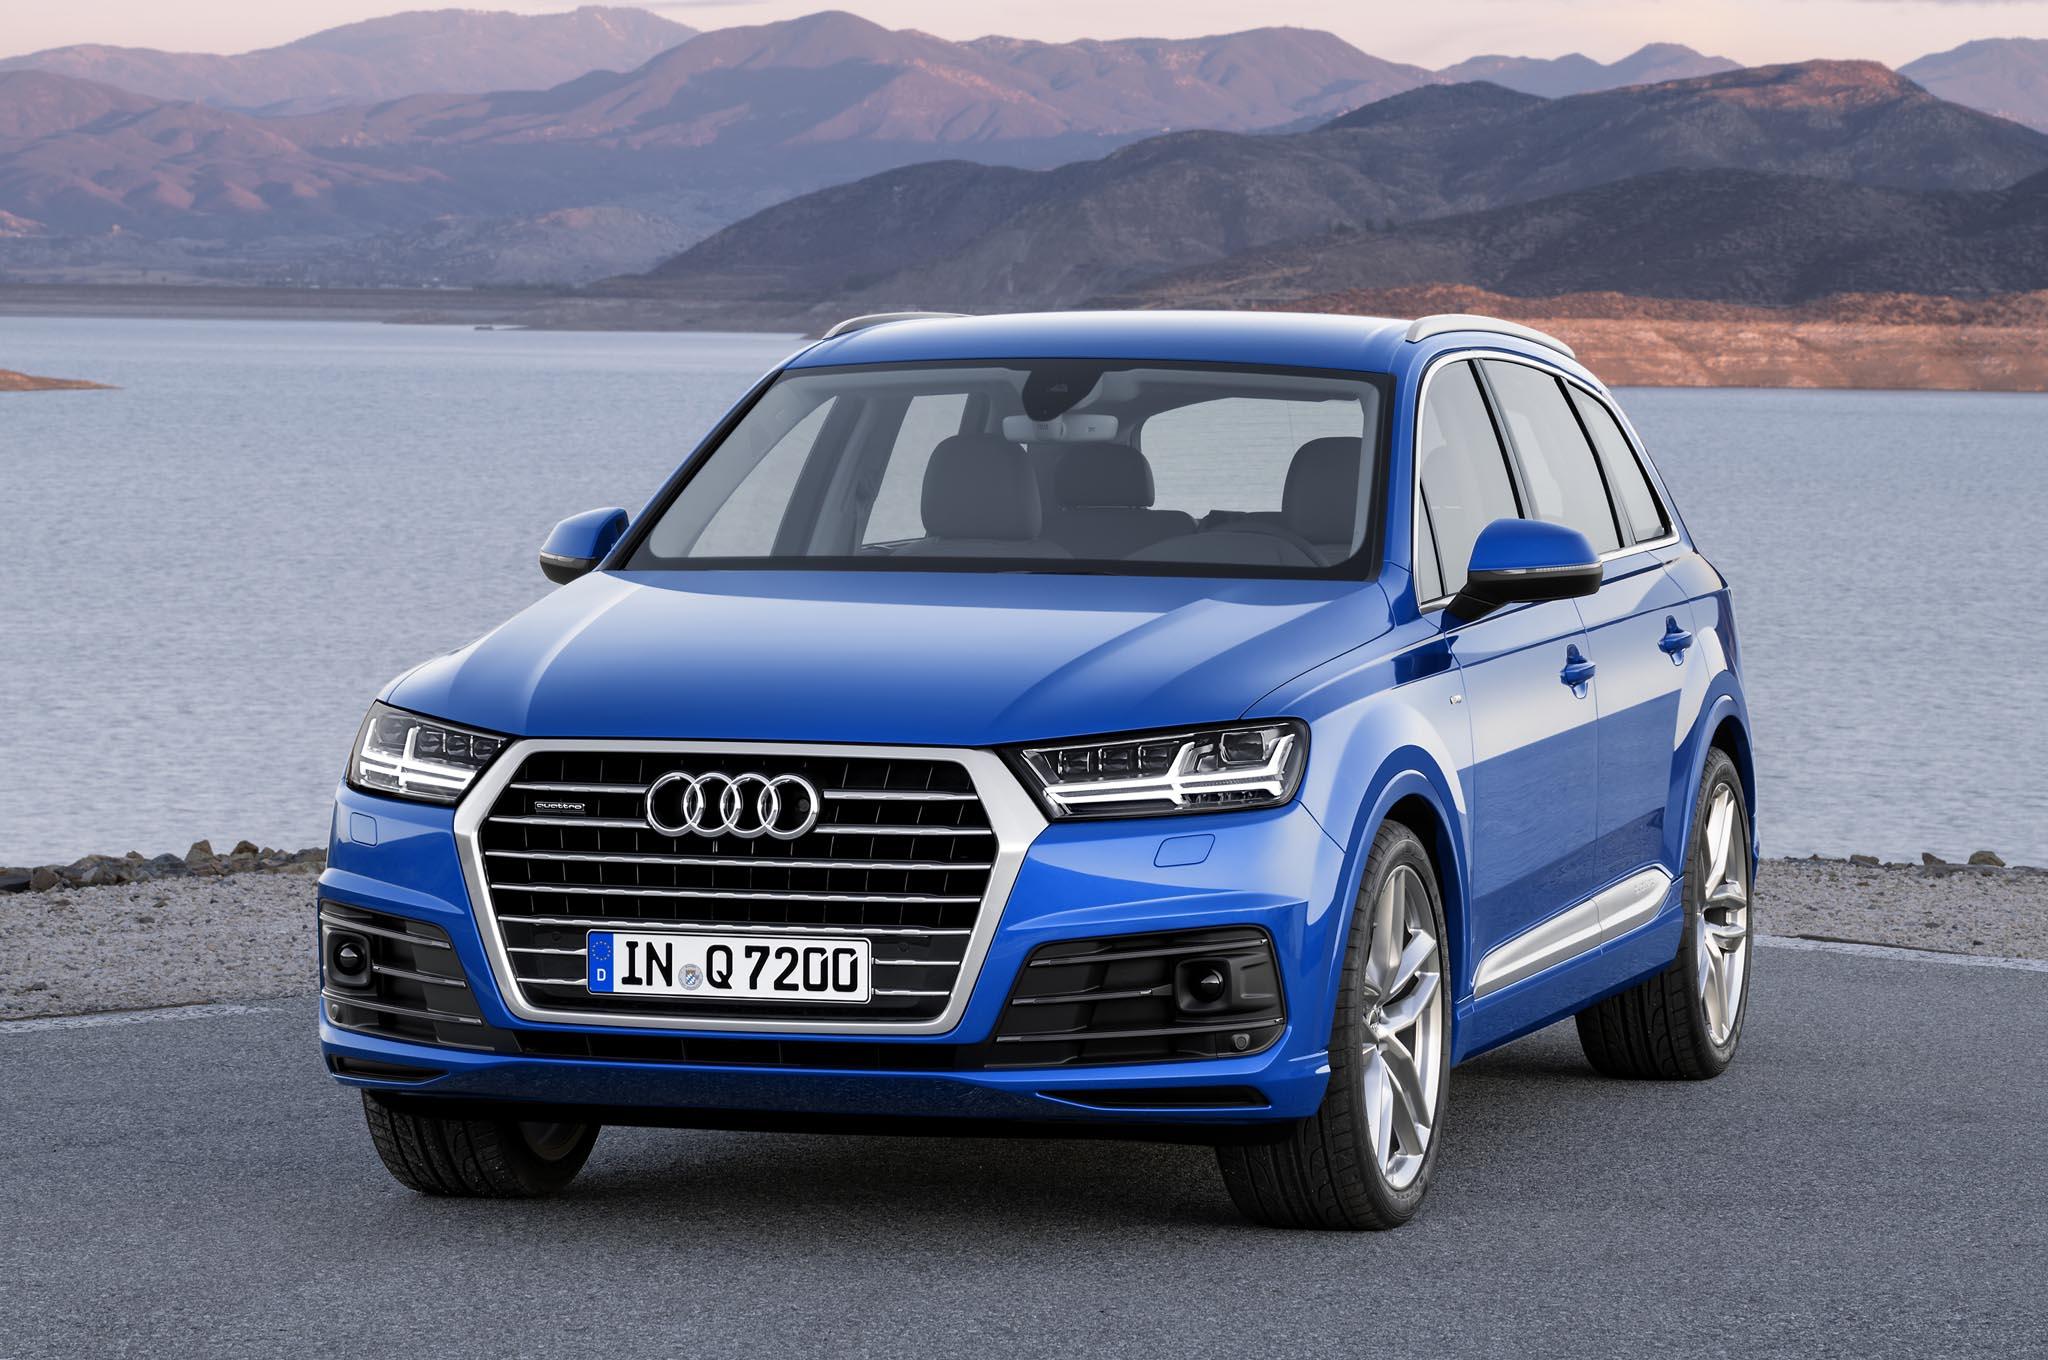 Audi Q (View 7 of 8)